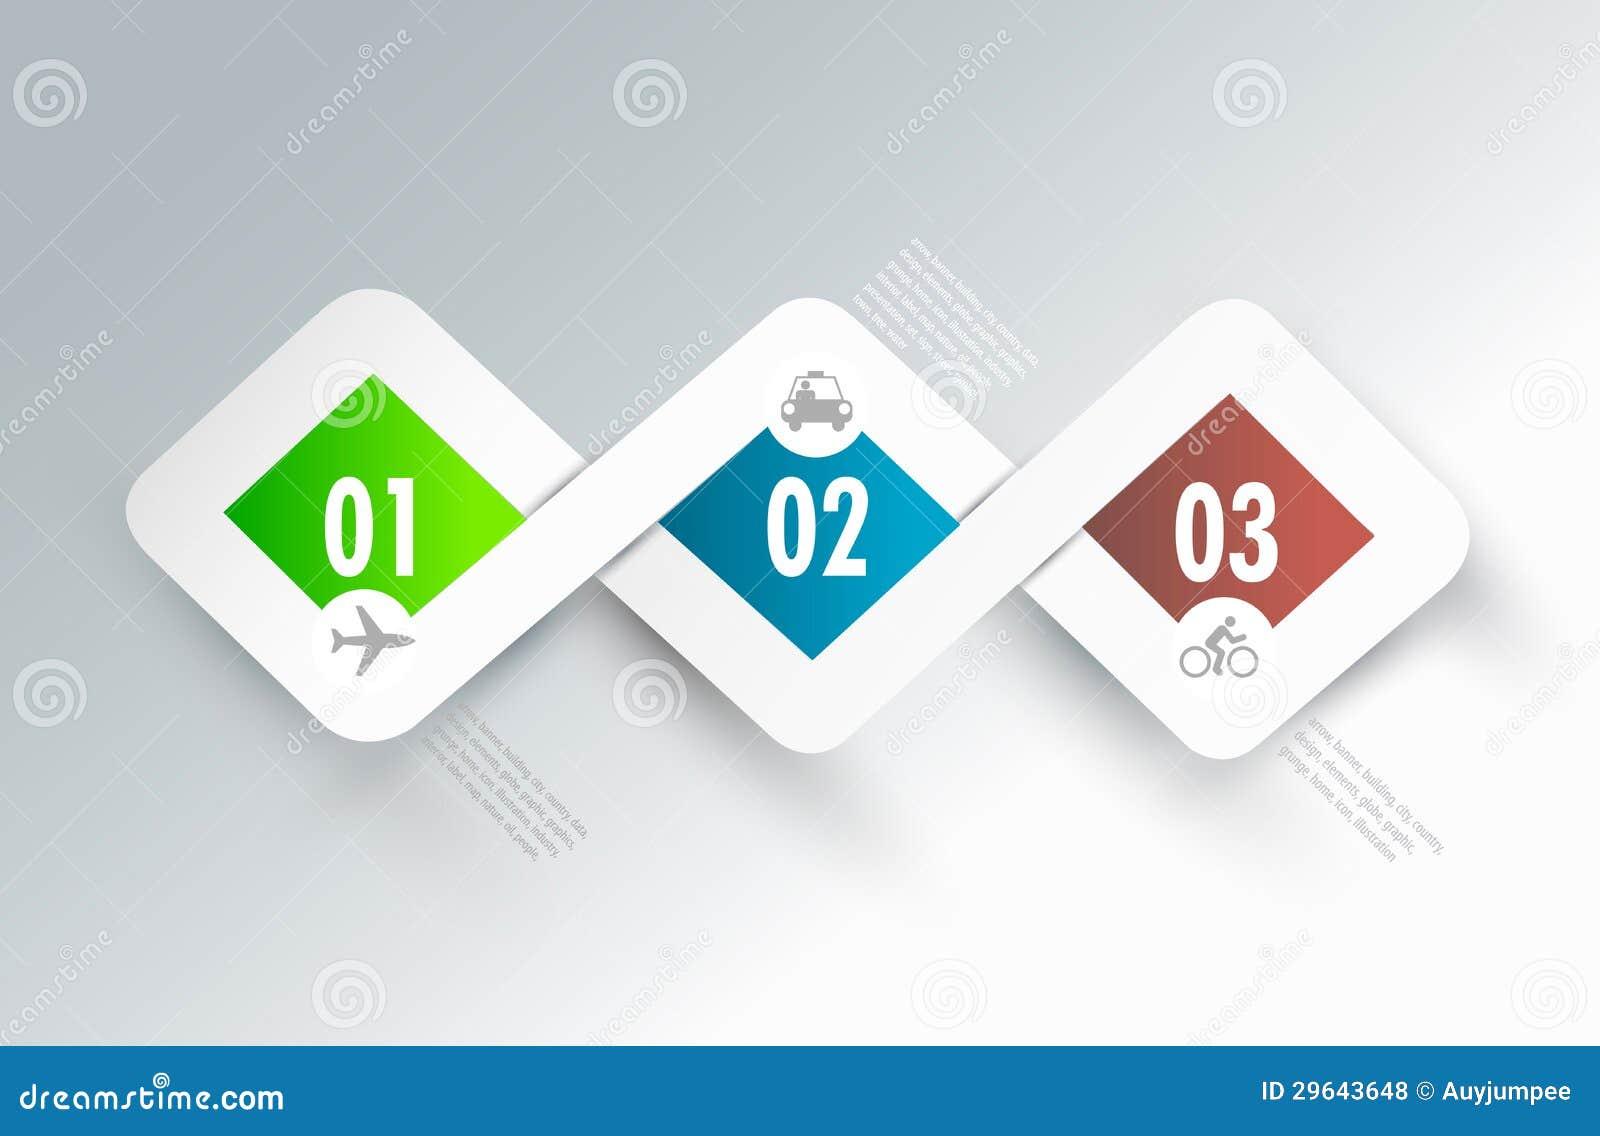 Design elements banner - Infographic Banner Design Elements Communication Royalty Free Stock Photos